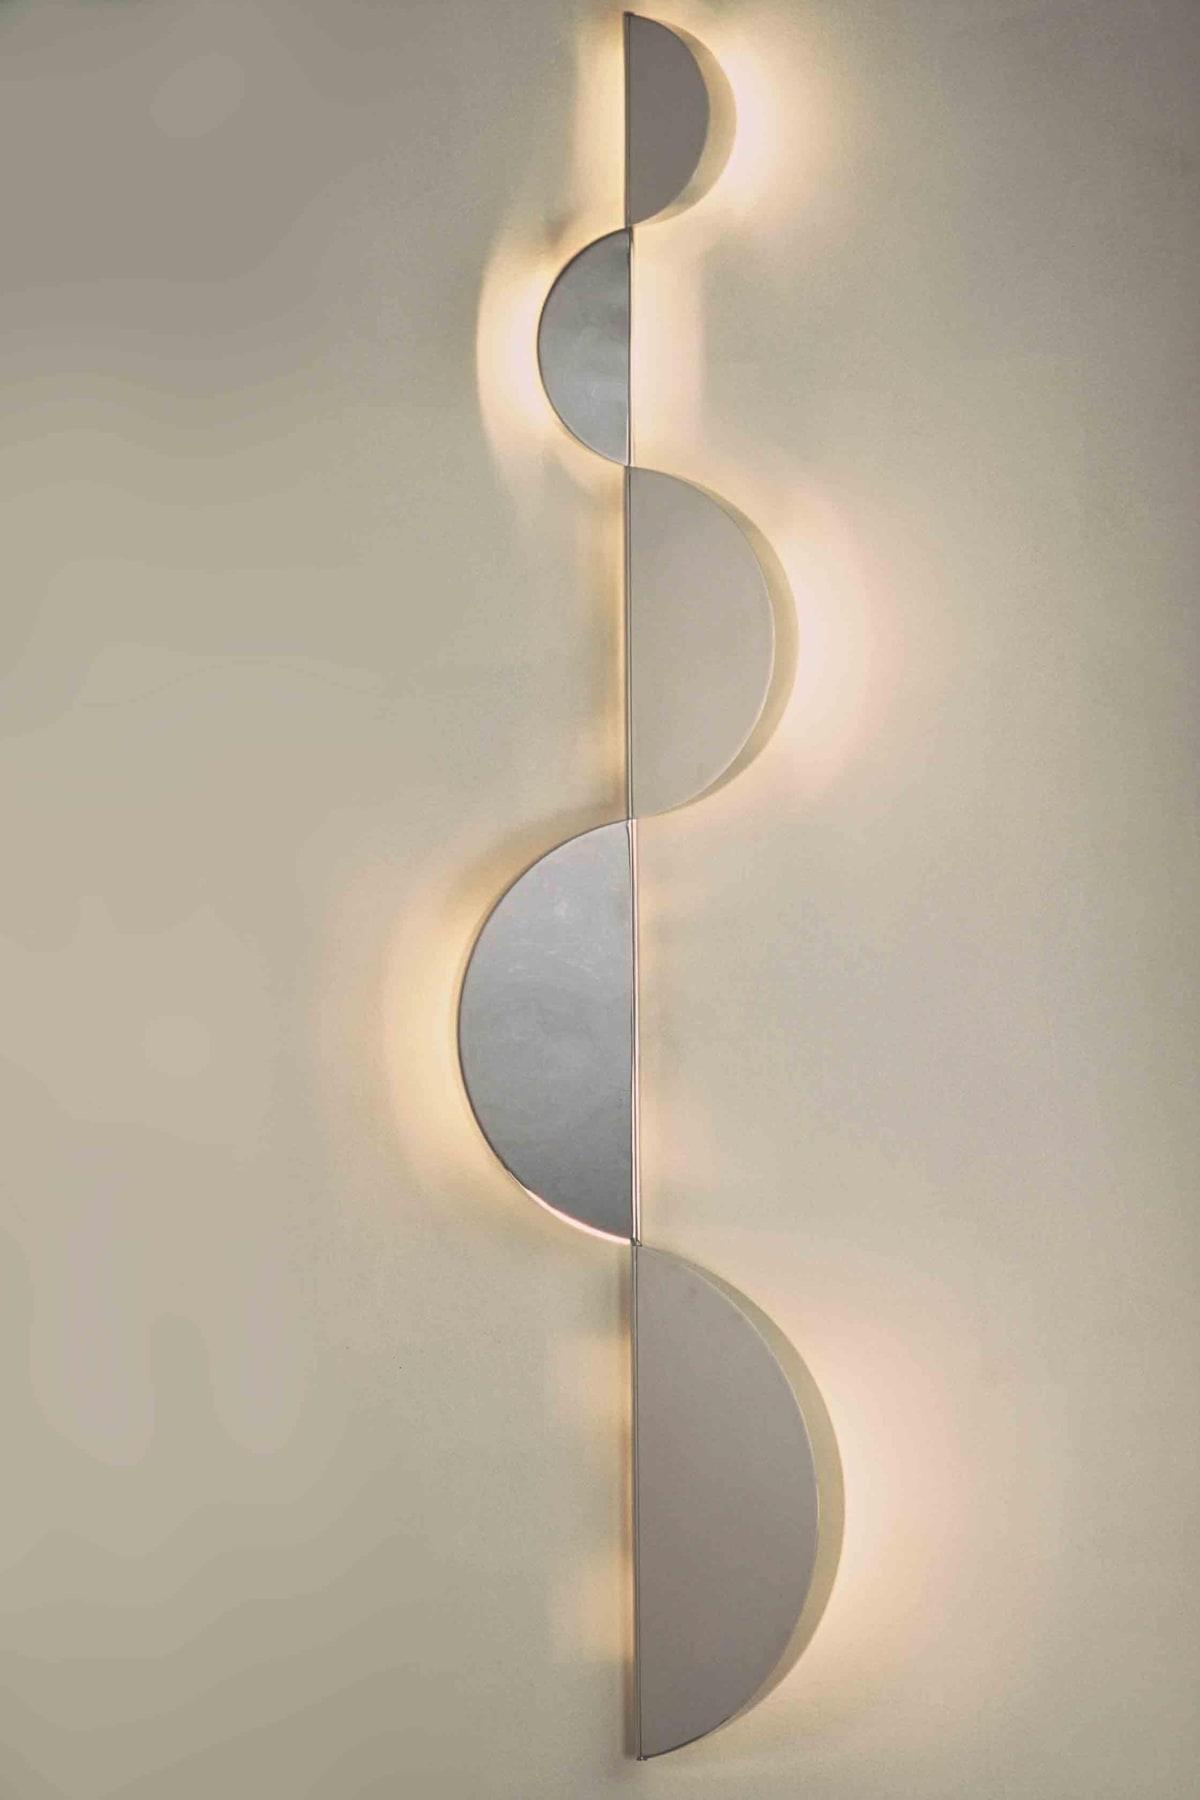 Hubert Le Gall, Serpentine Lights, 2005